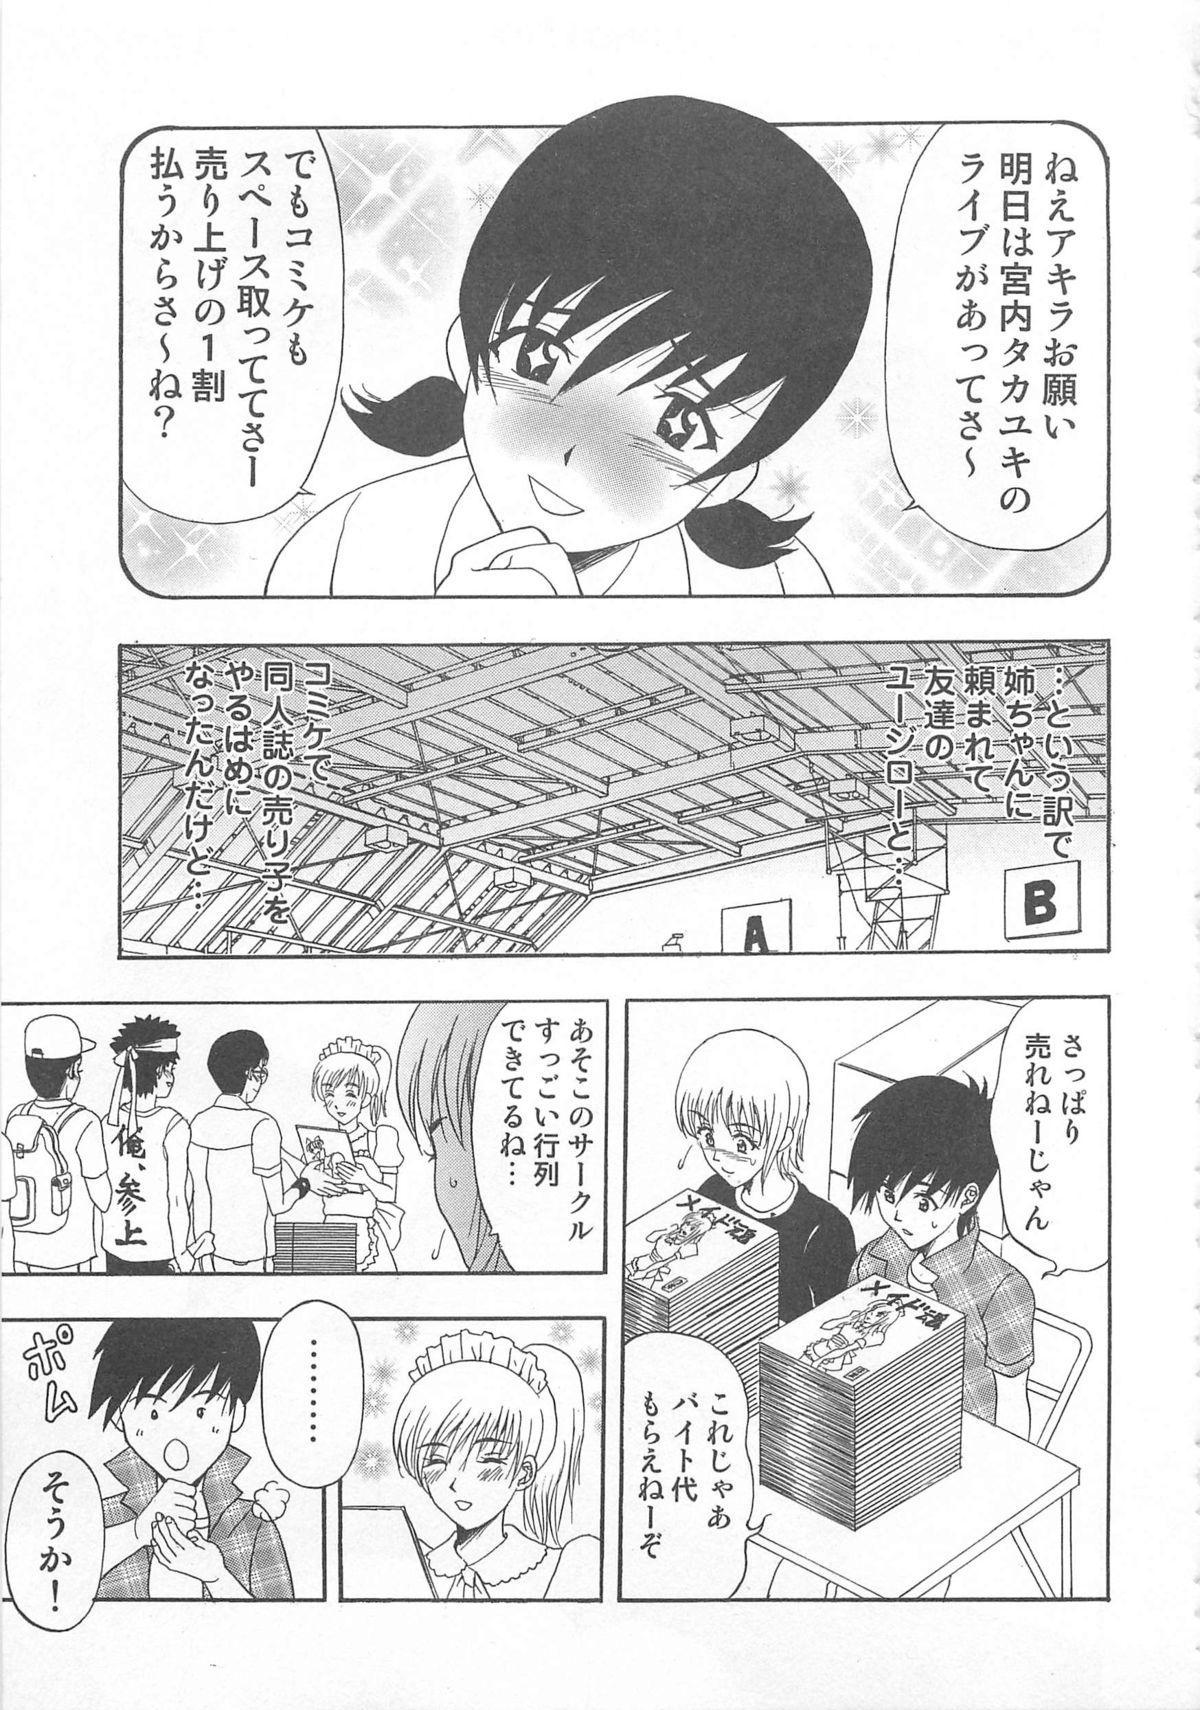 Otokonoko HEAVEN Vol. 02 Dokidoki Chikan Taiken 71